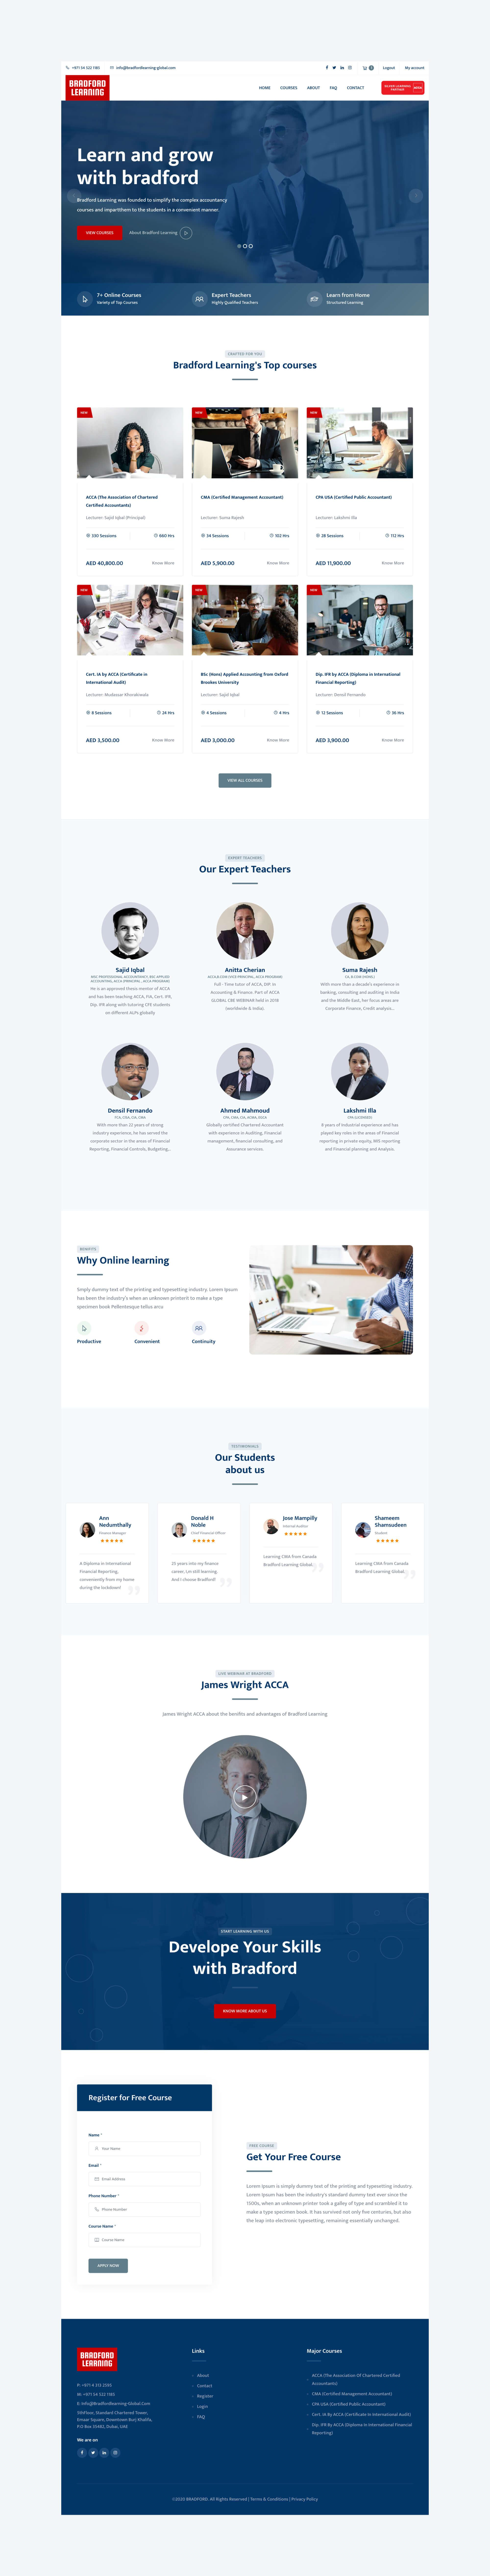 Bradford Learning Global website by freelance web designer Sajid Sulaiman